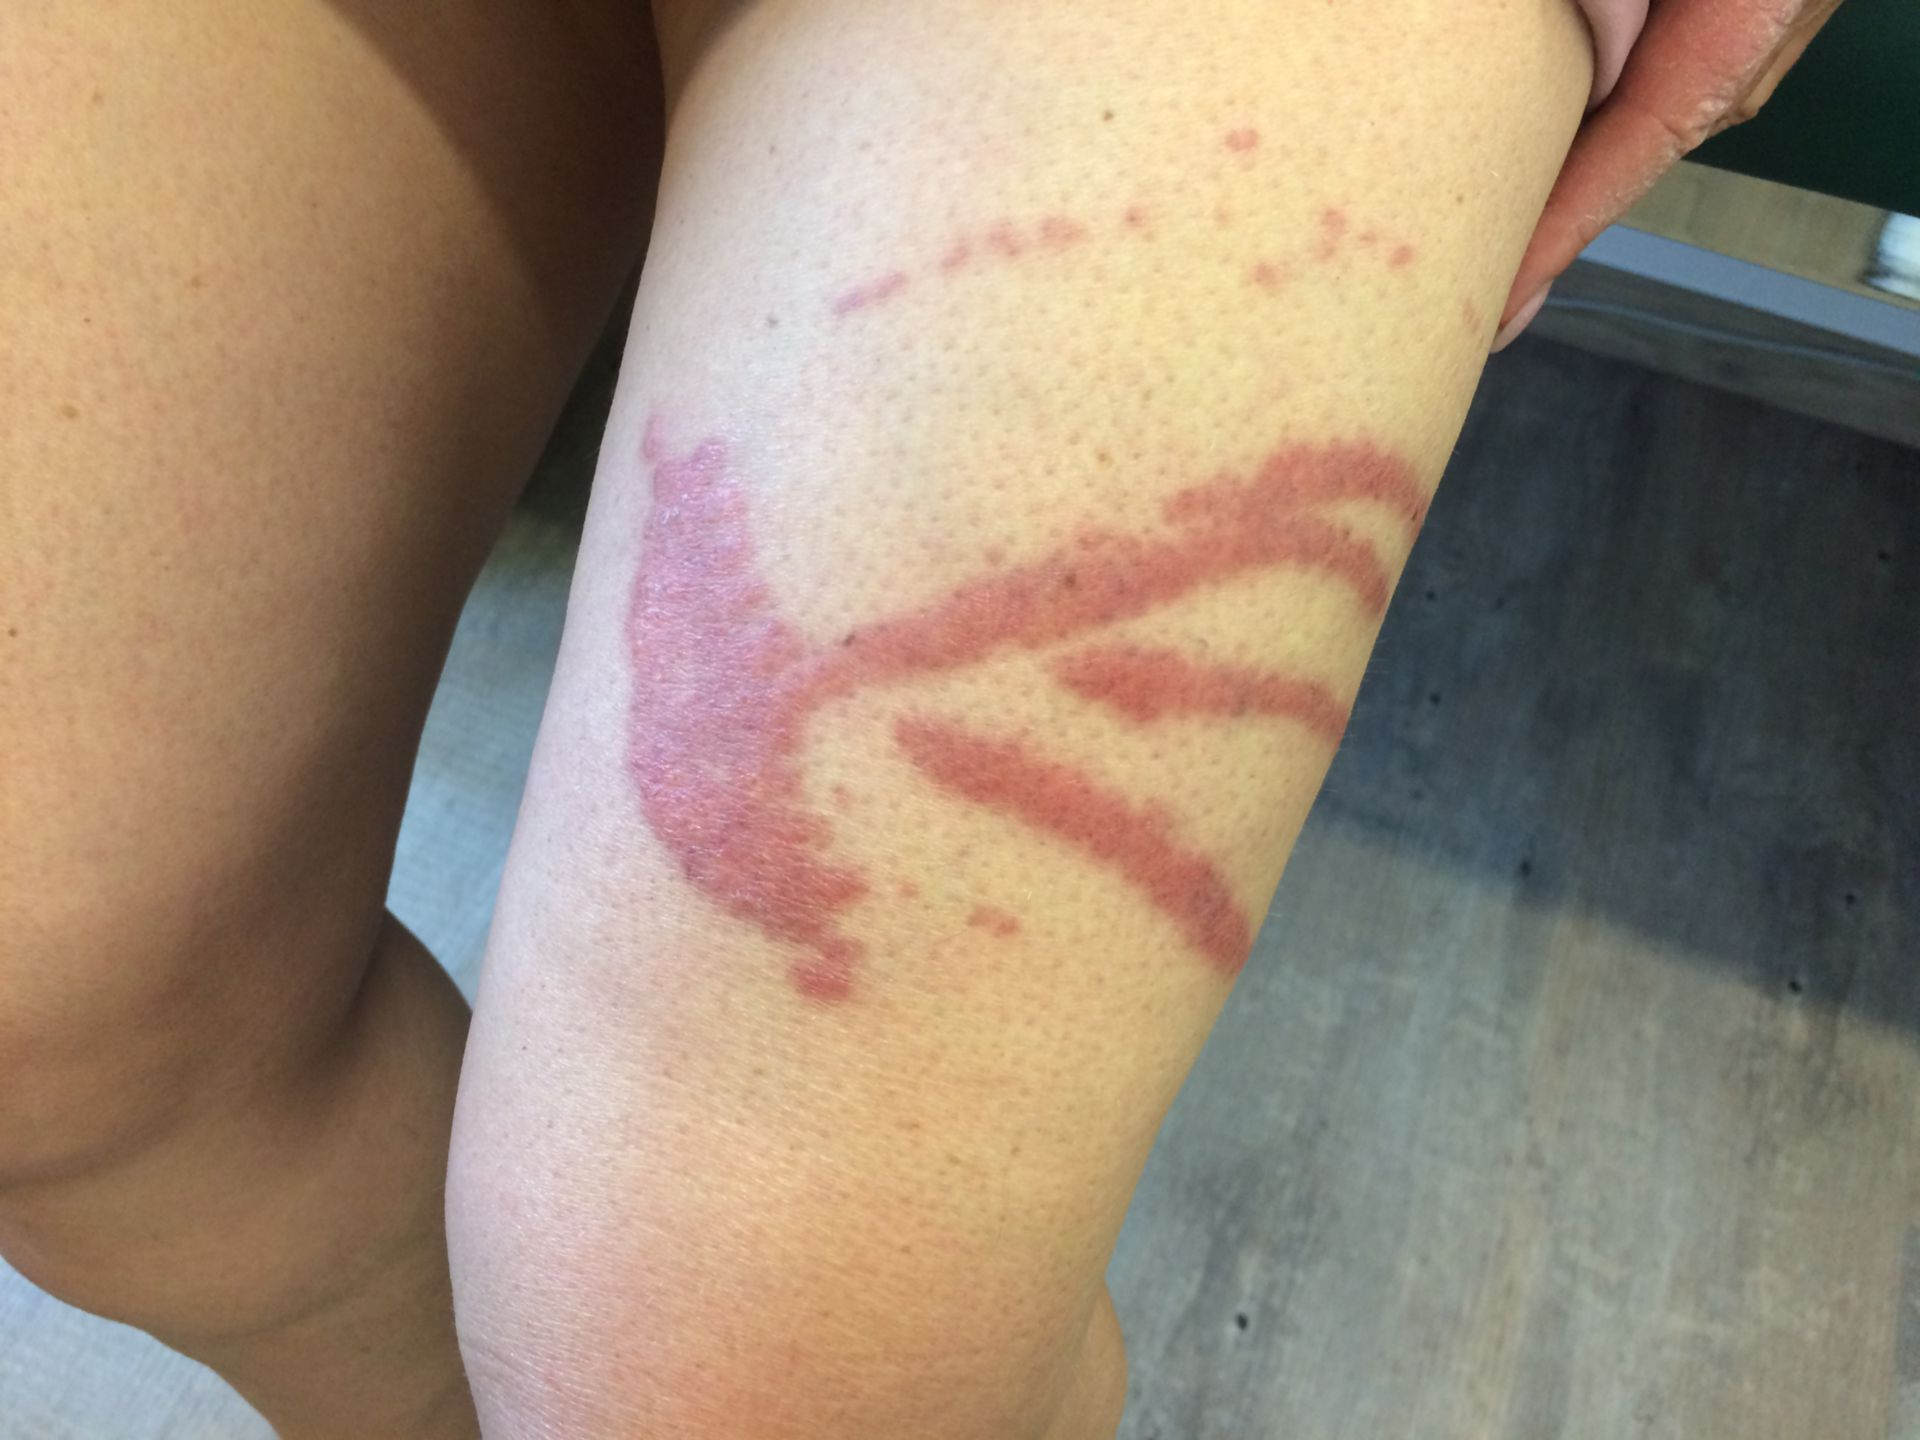 Nesselverletzung durch Quallenkontakt